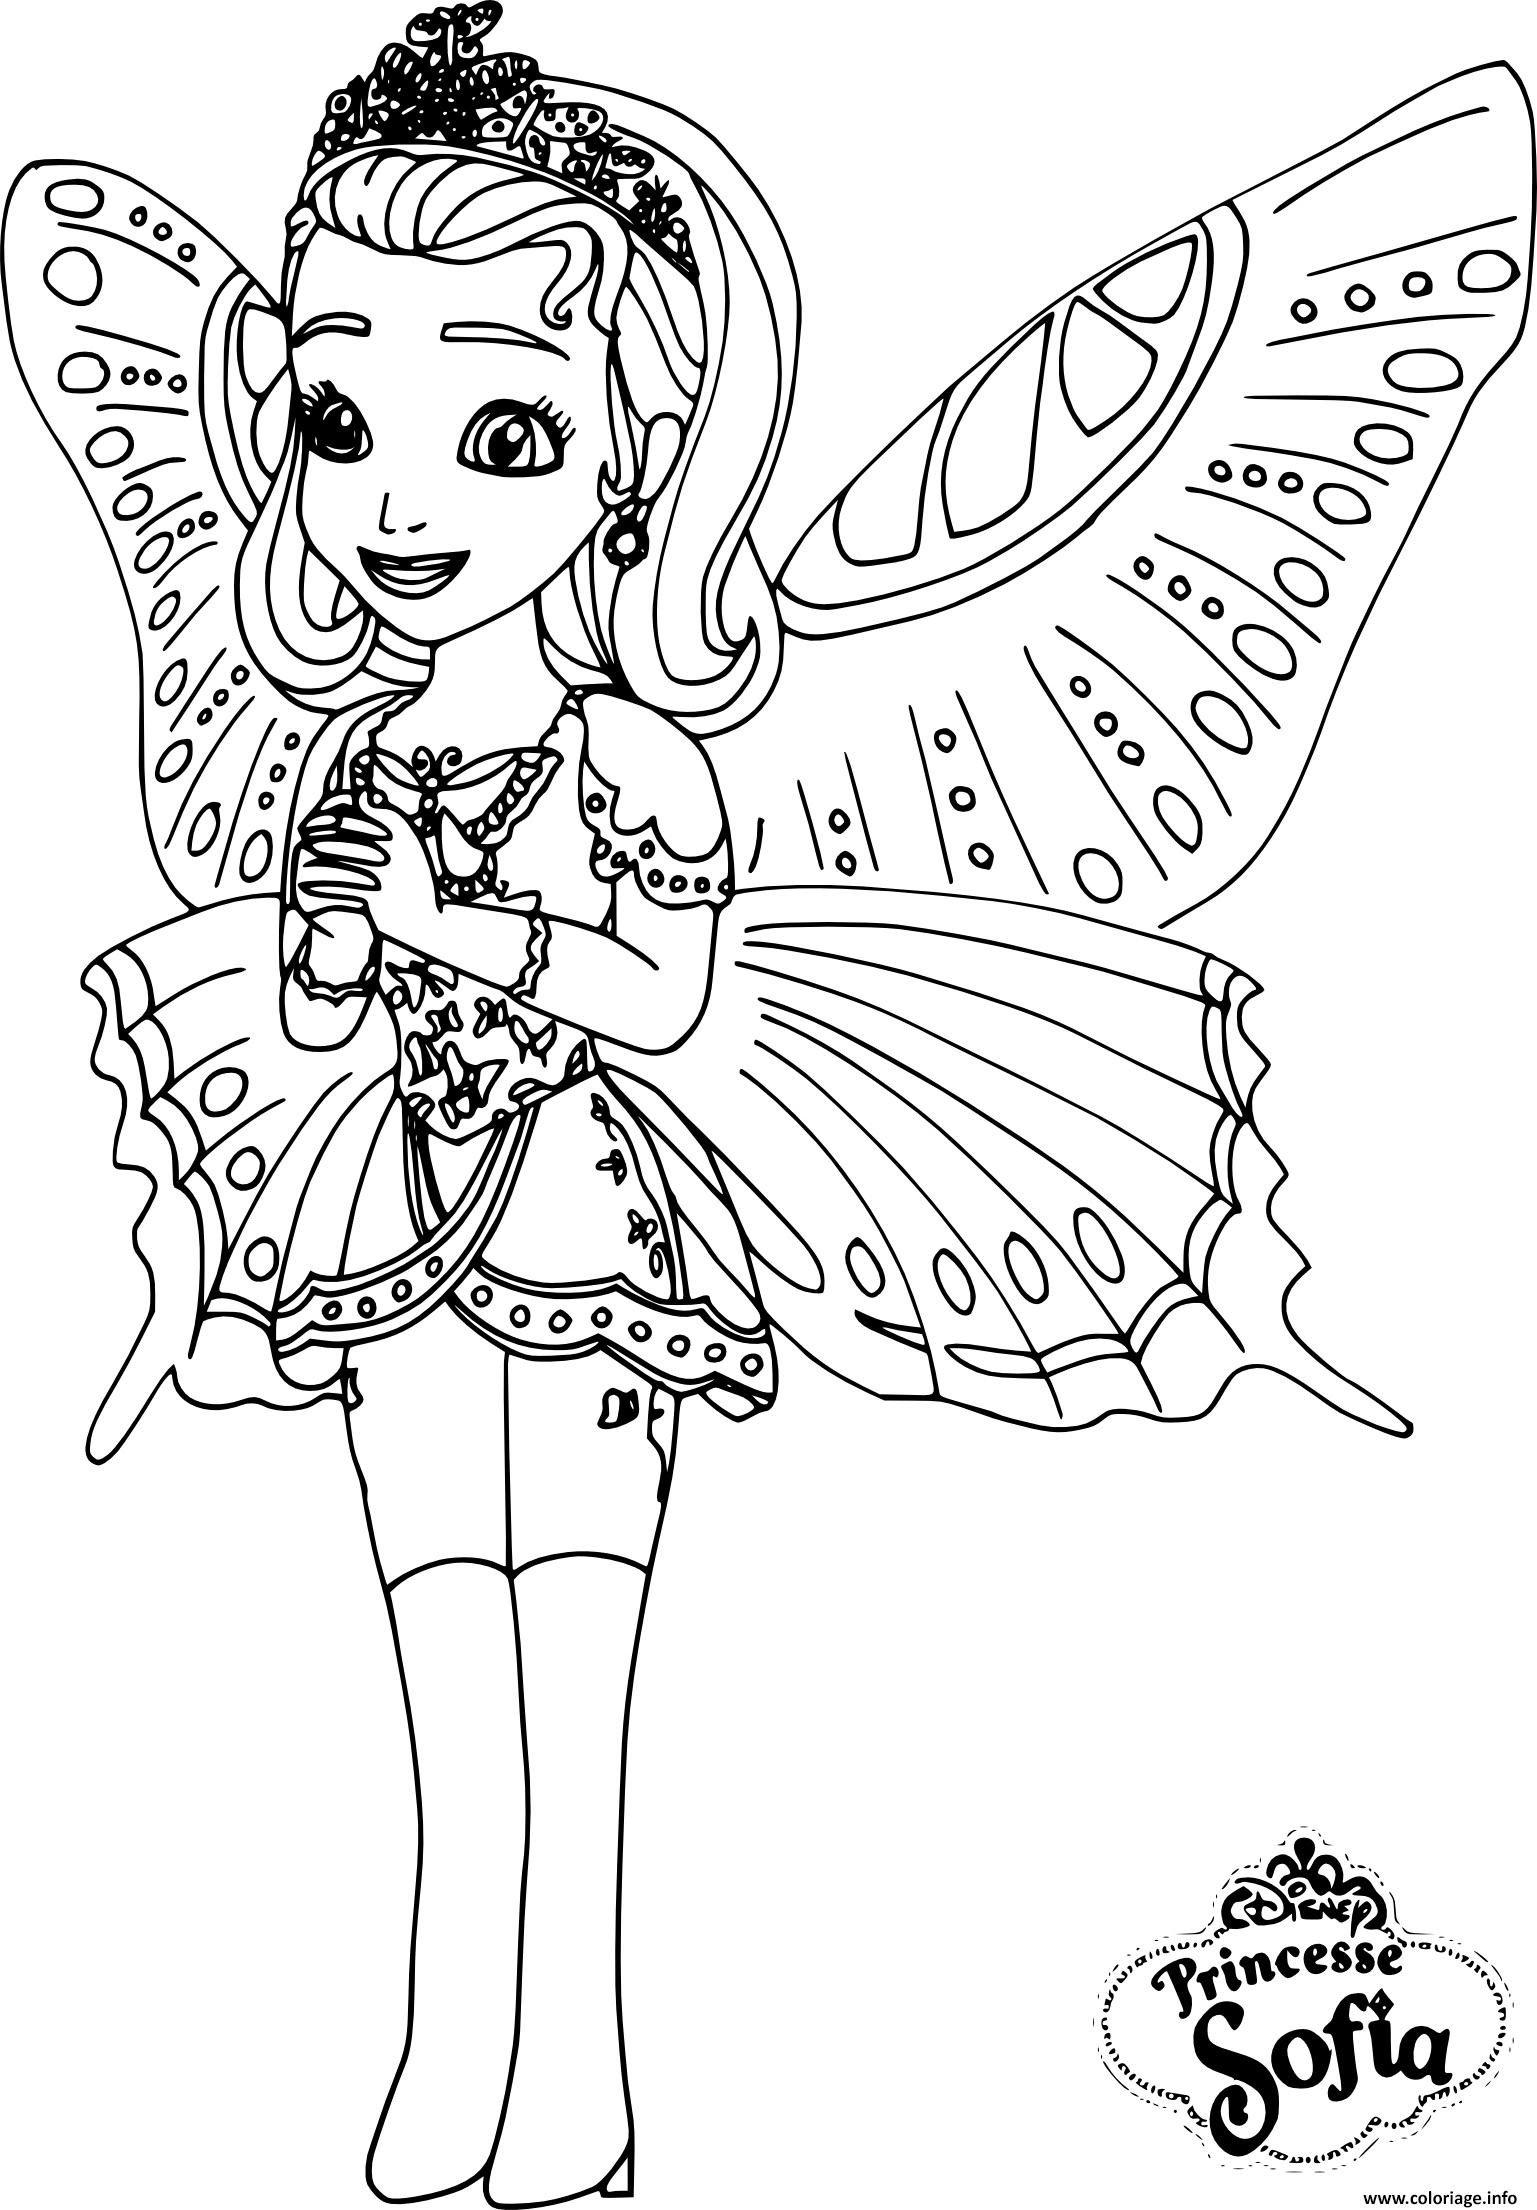 Coloriage Princesse Sofia Papillon Dessin  Imprimer